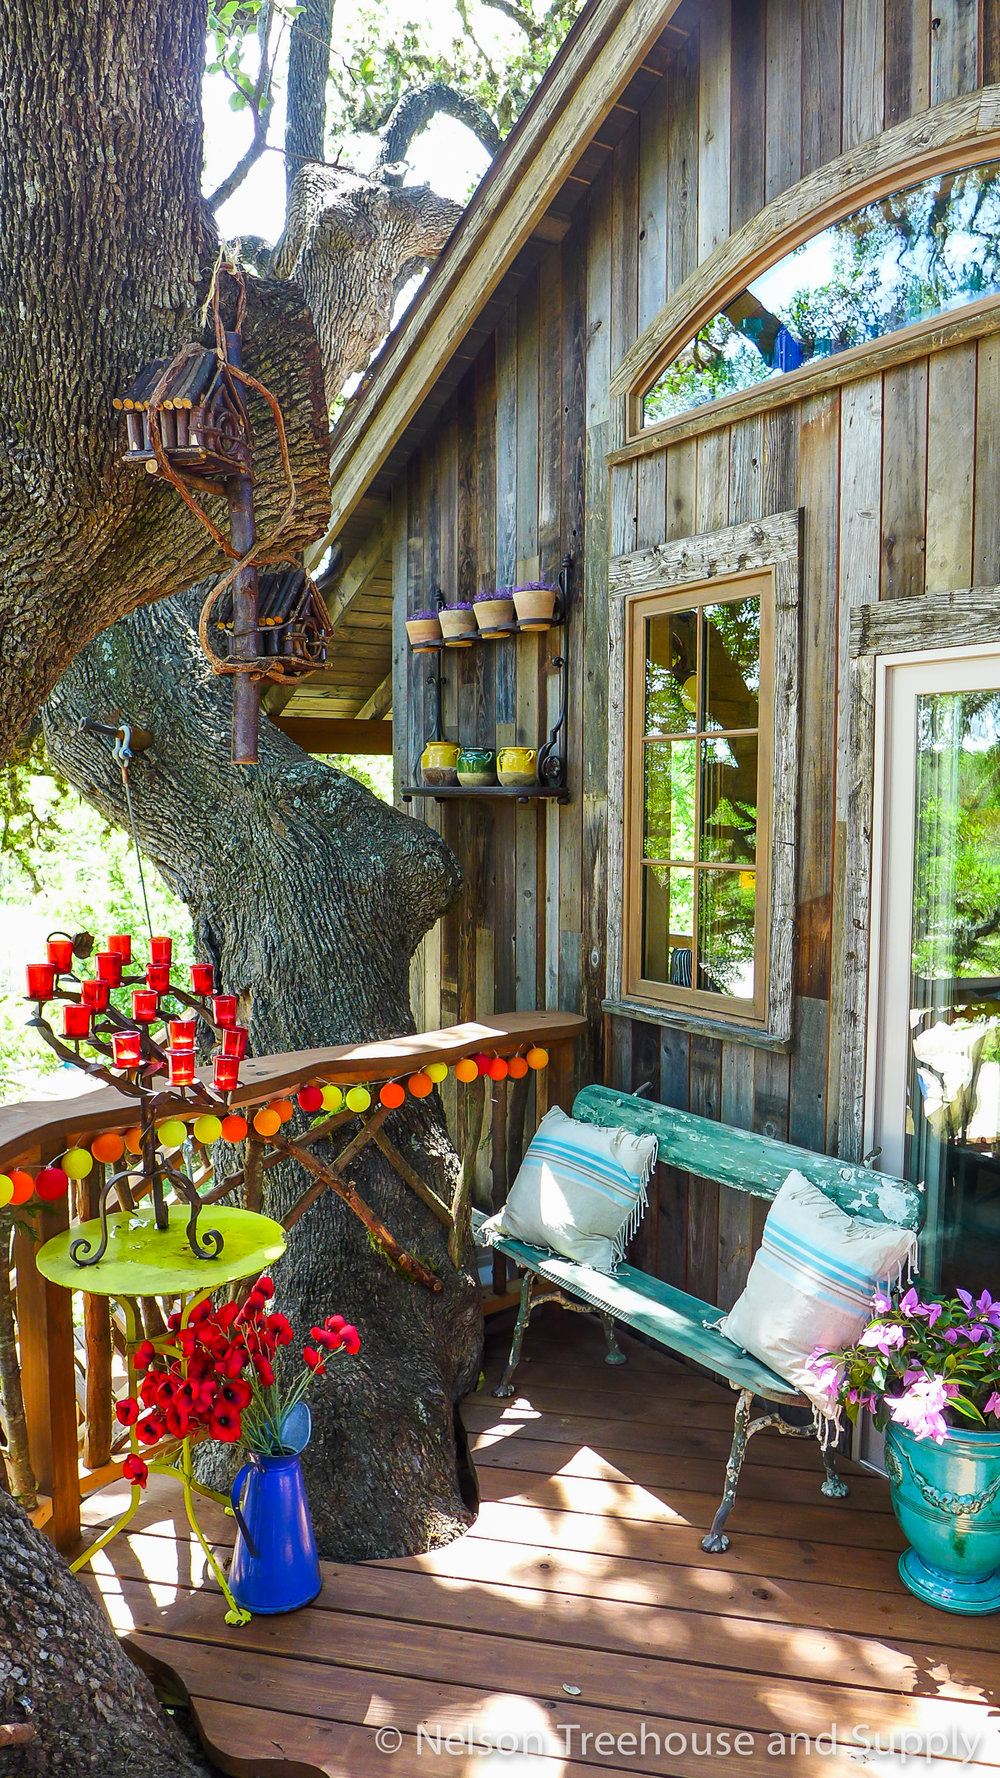 laurel-restaurant-treehouse-deck